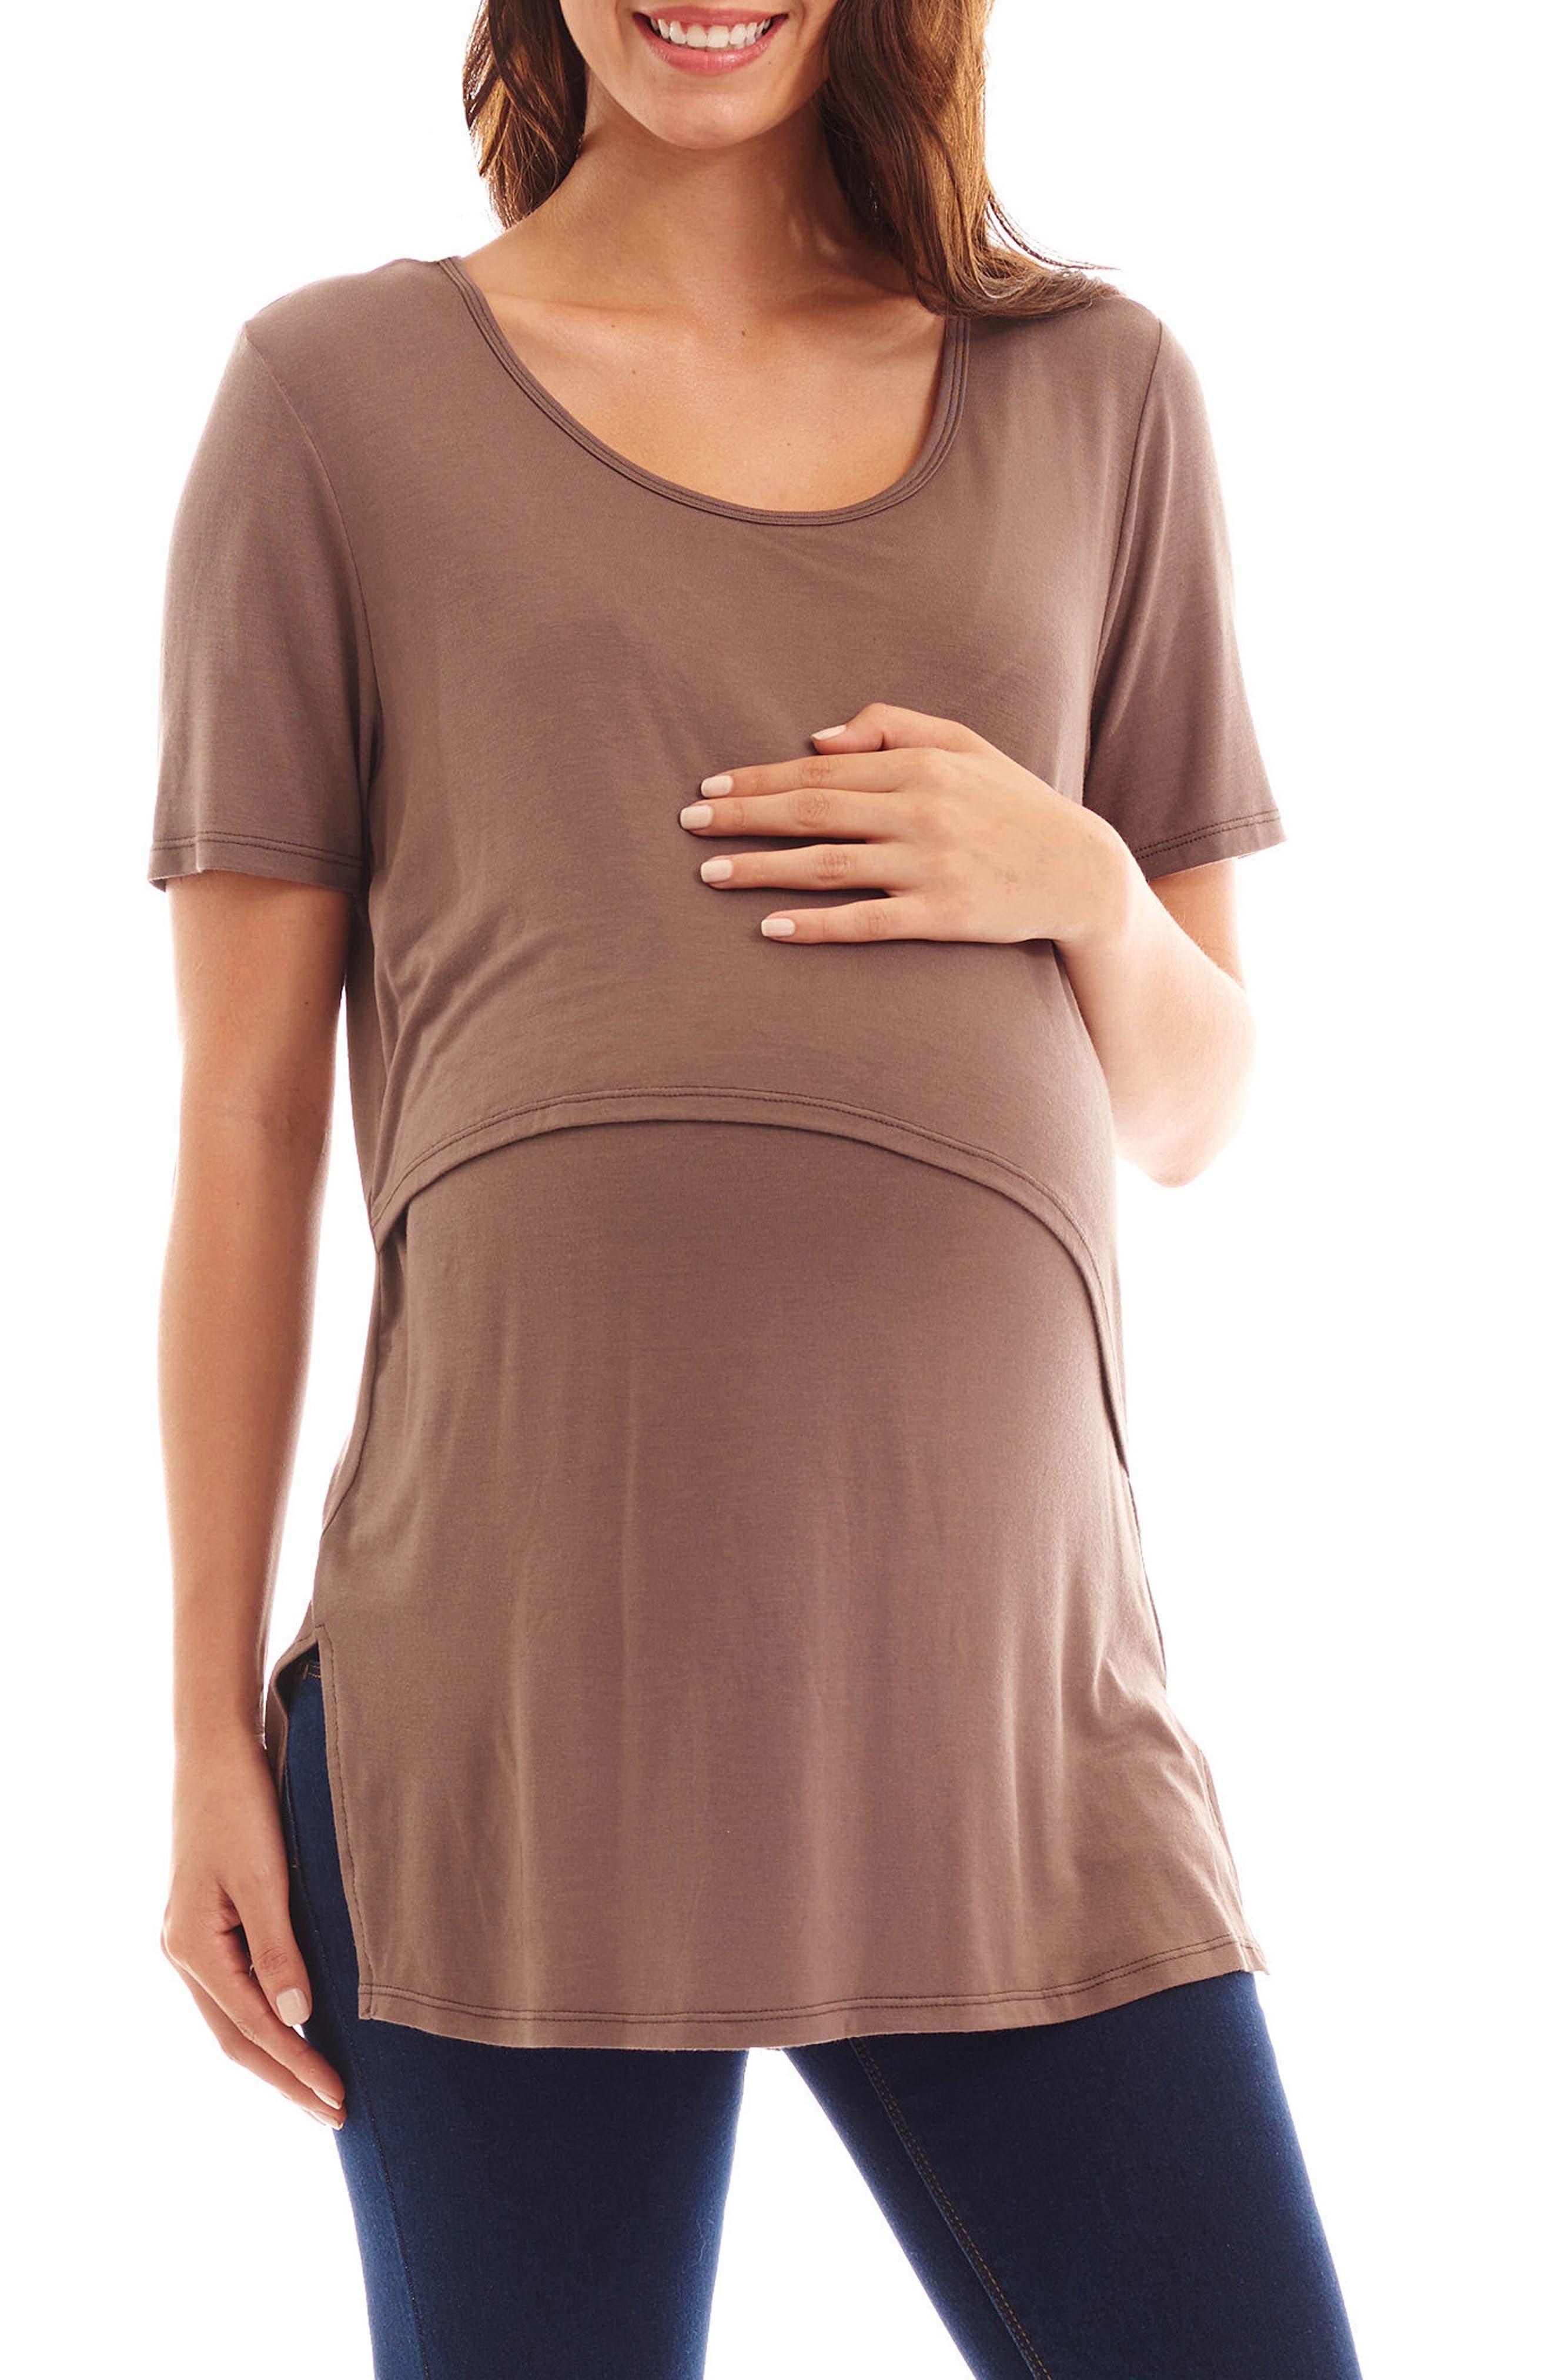 Everly Grey Sydney Maternity/Nursing Top